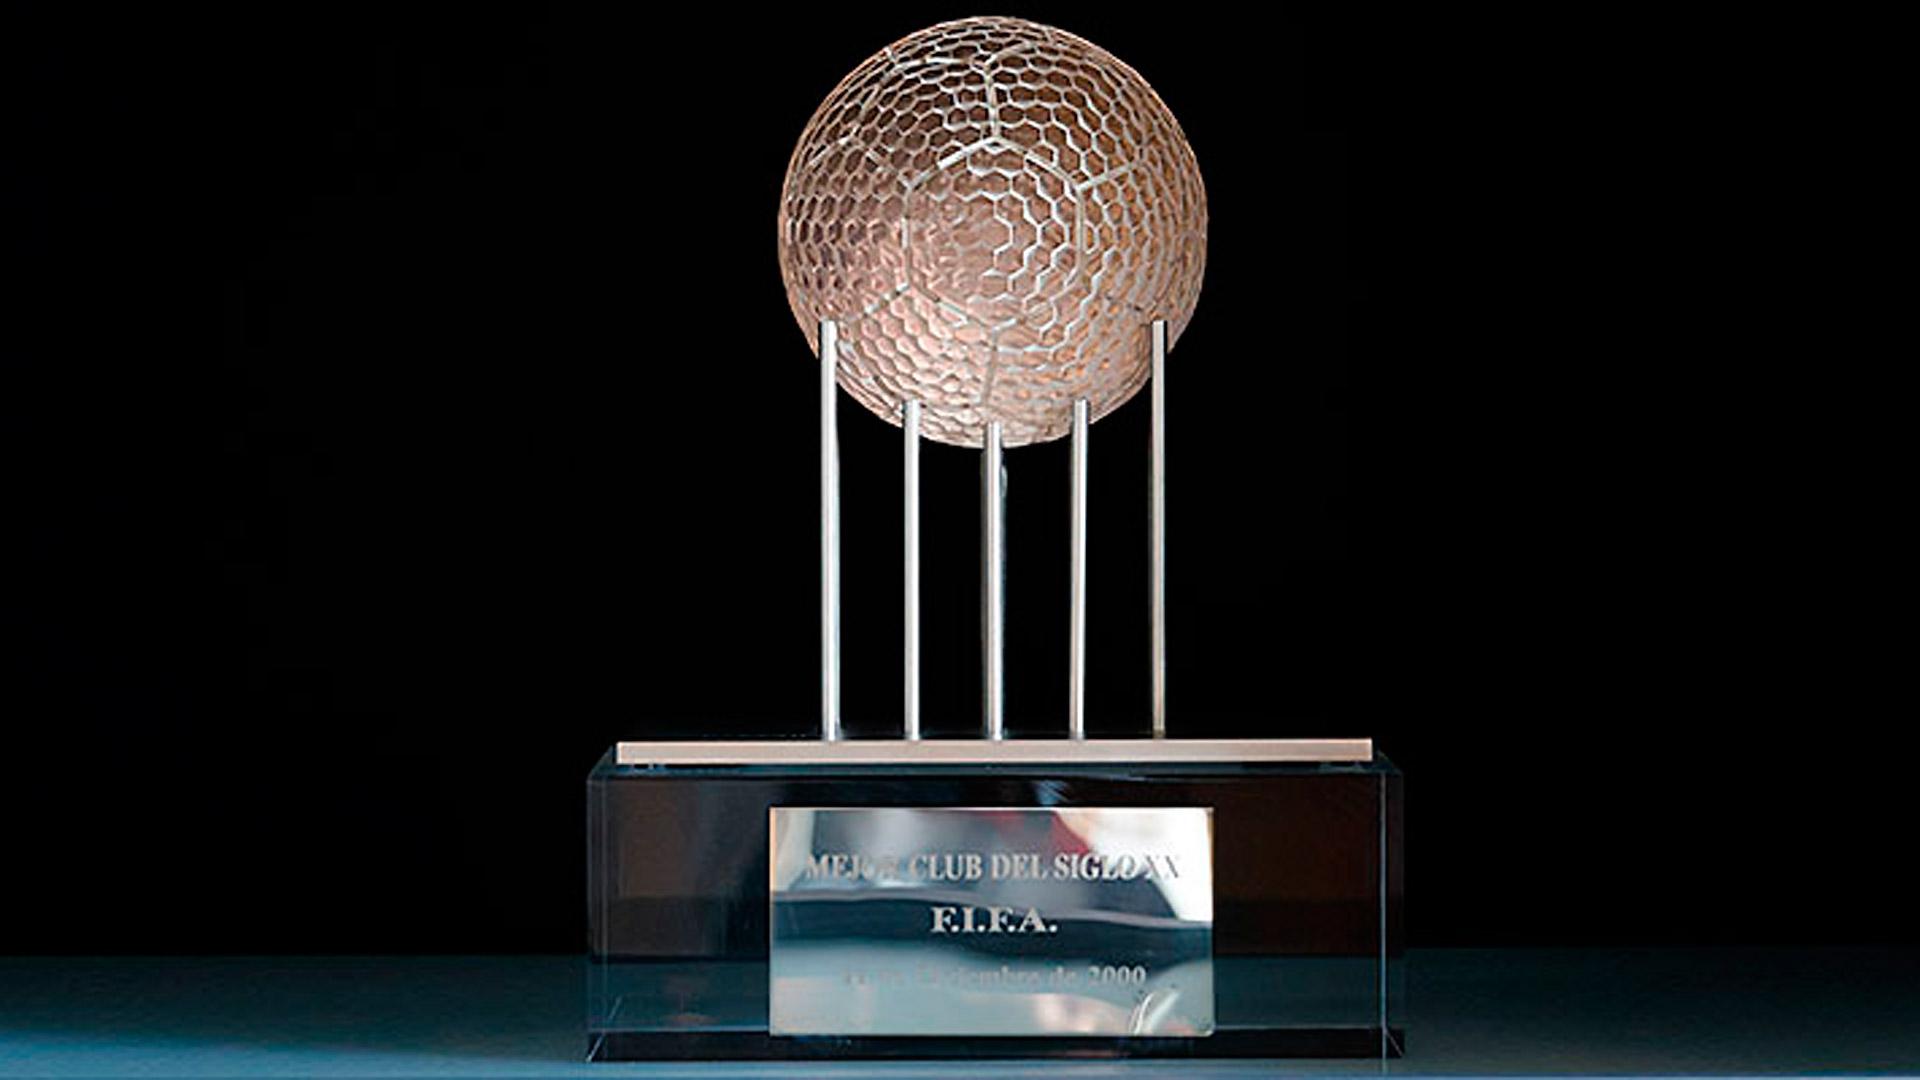 Trofeo mejor club siglo XX FIFA